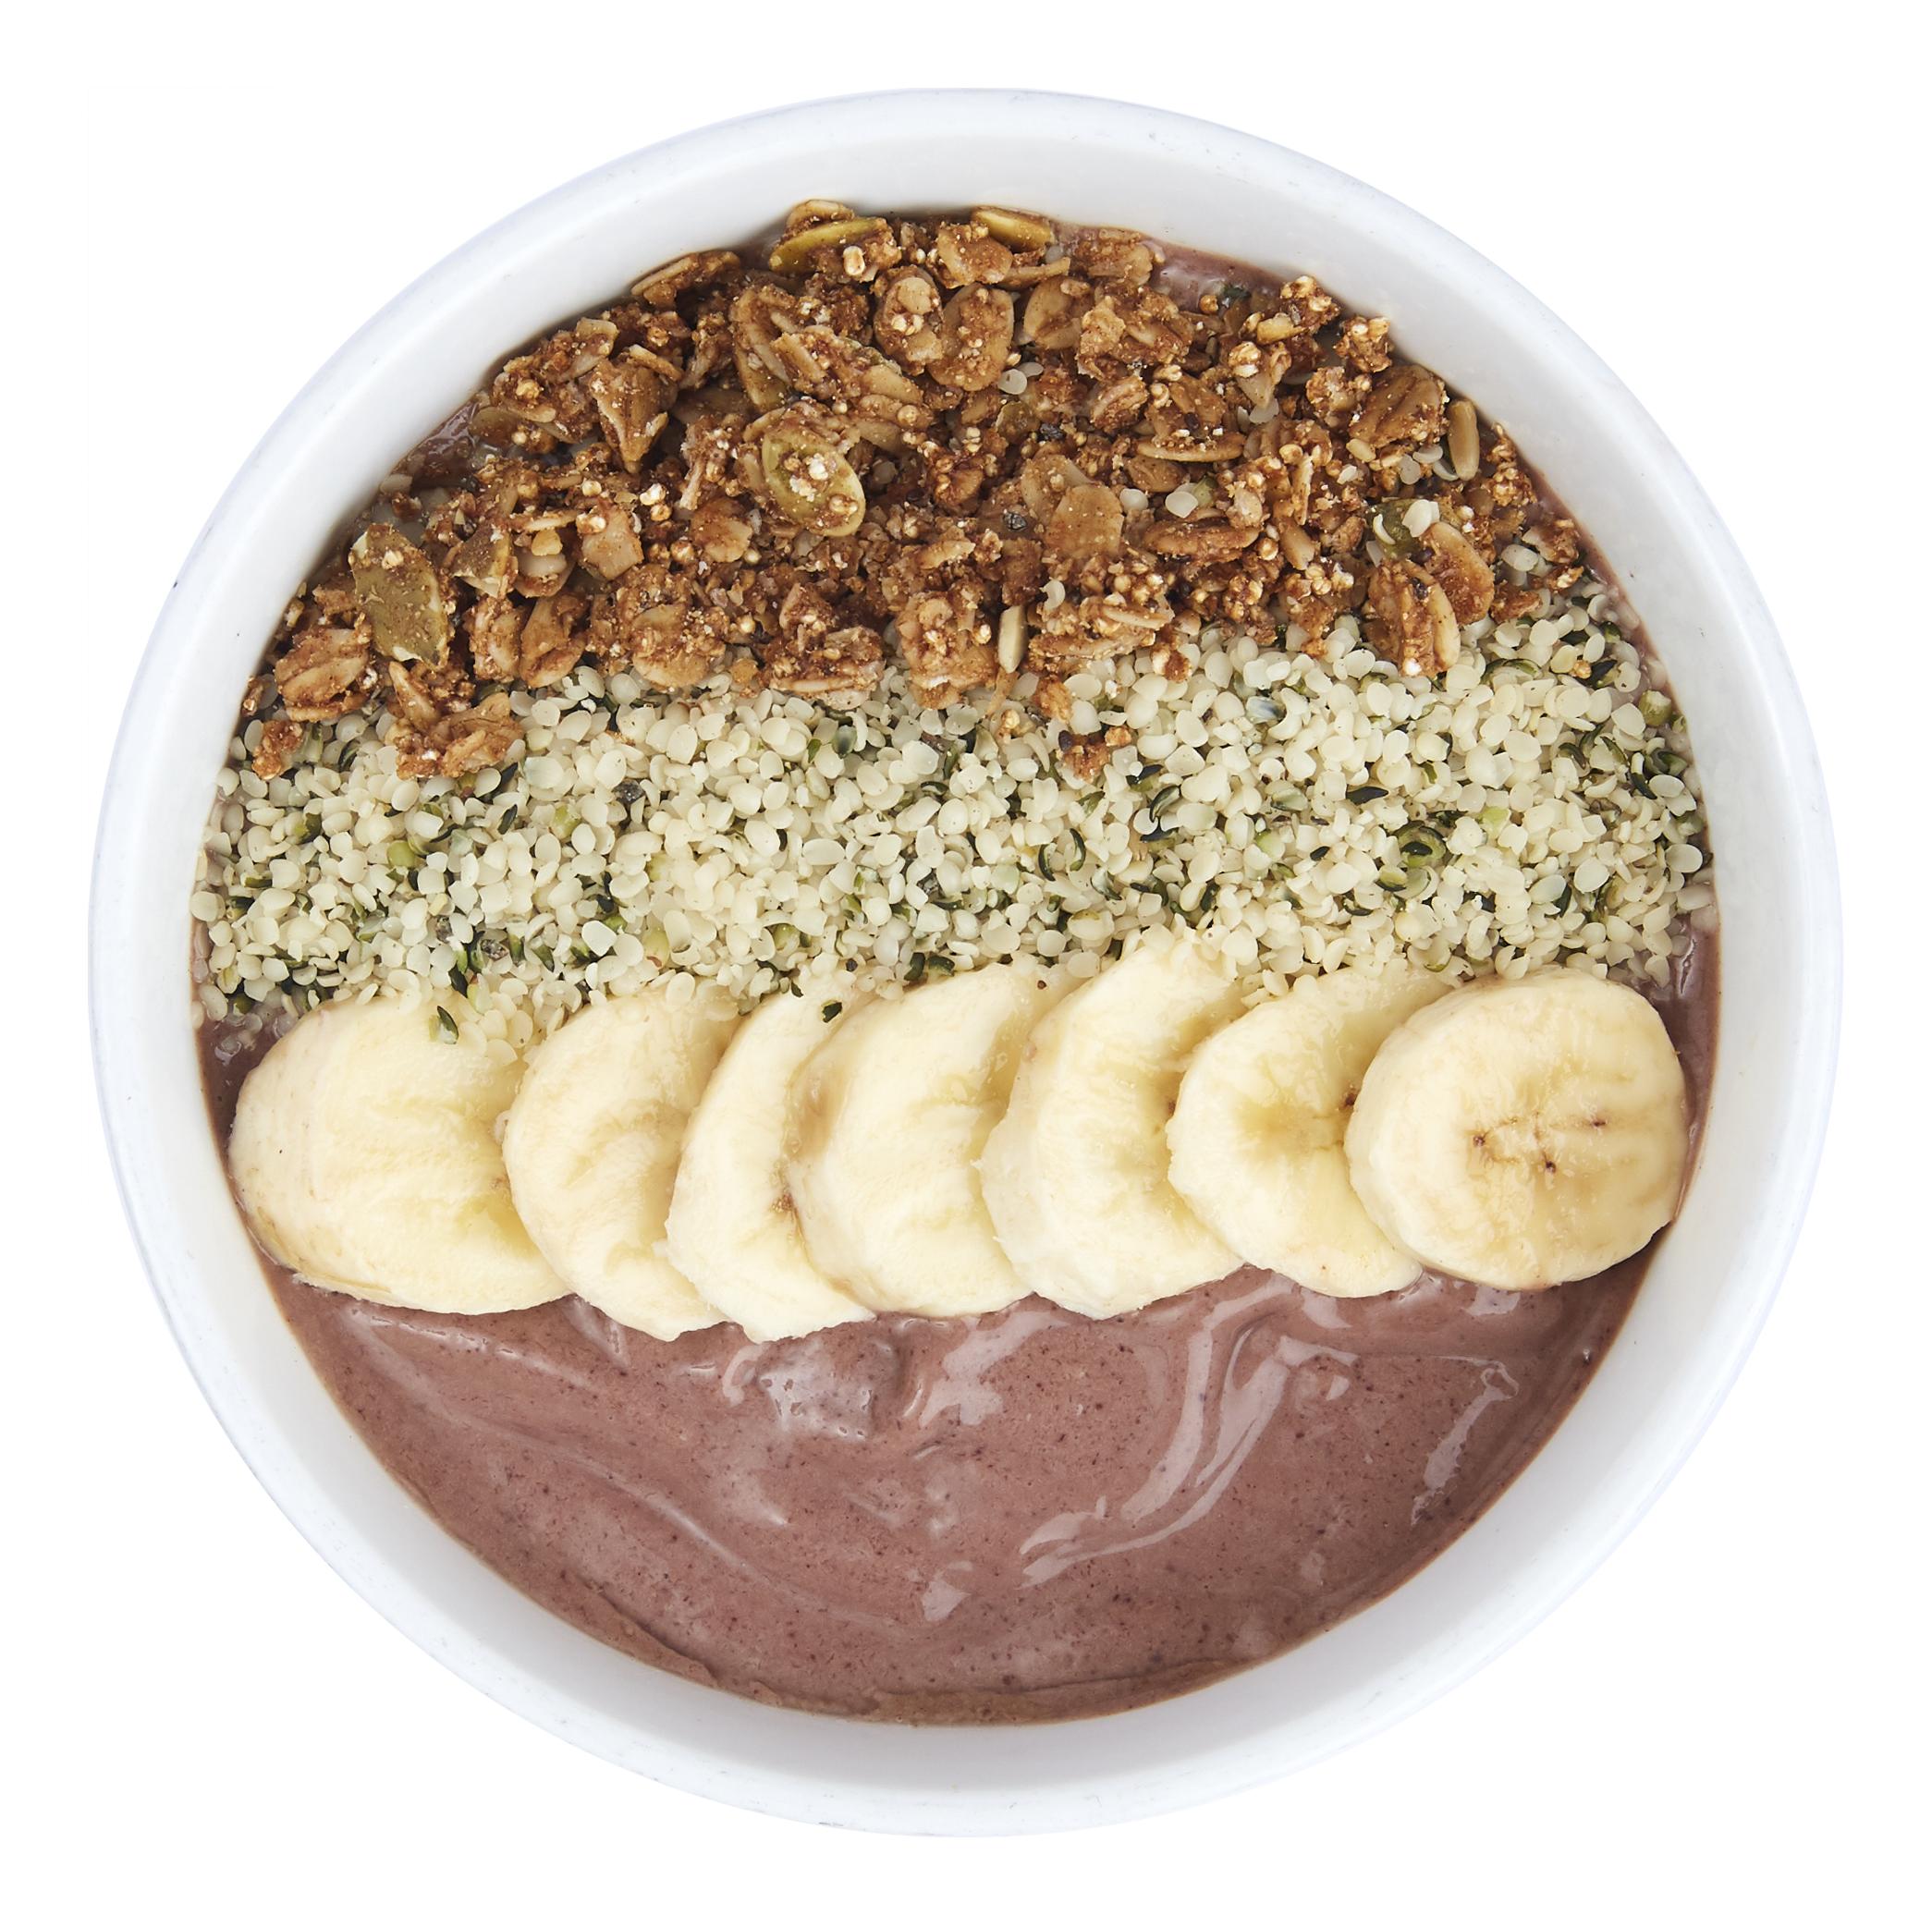 Açai   Chocolate bowl  -$10.50  Banana, acai, avocado, cocoa powder, maple syrup, almond milk.  Toppings: banana, hempseed, granola.